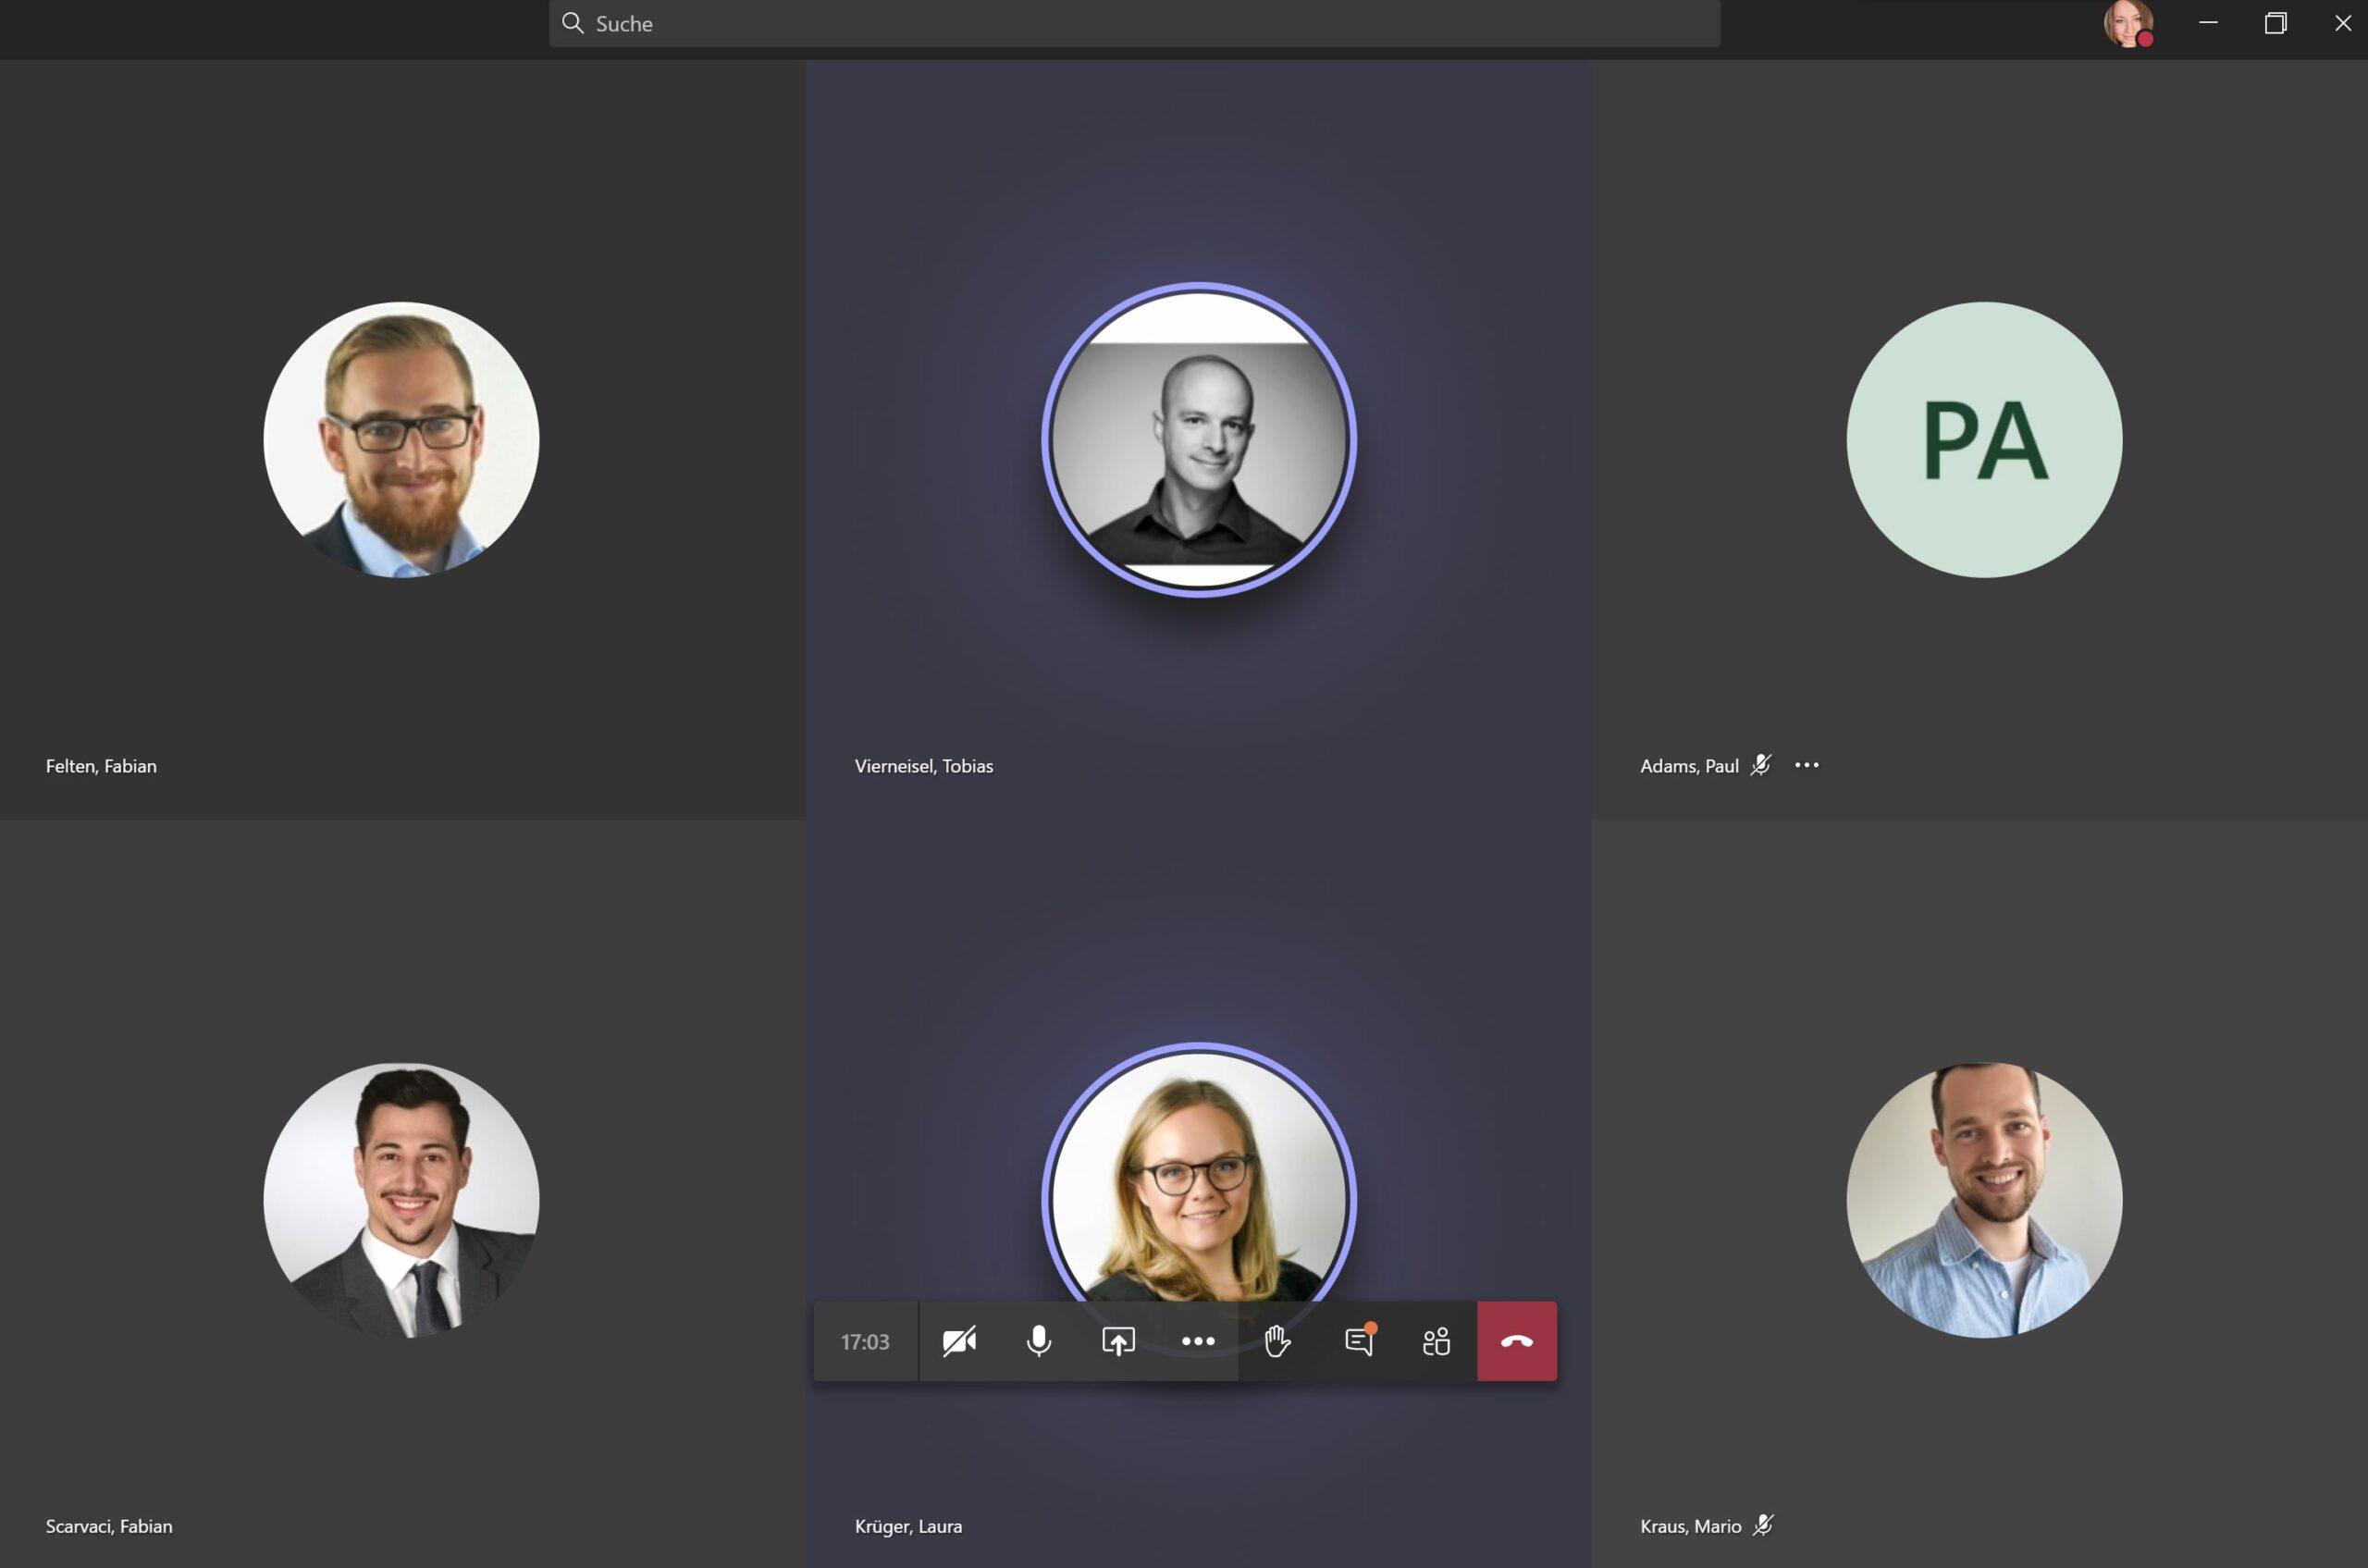 Microsoft Teams Meeting für digitale Kommunikation